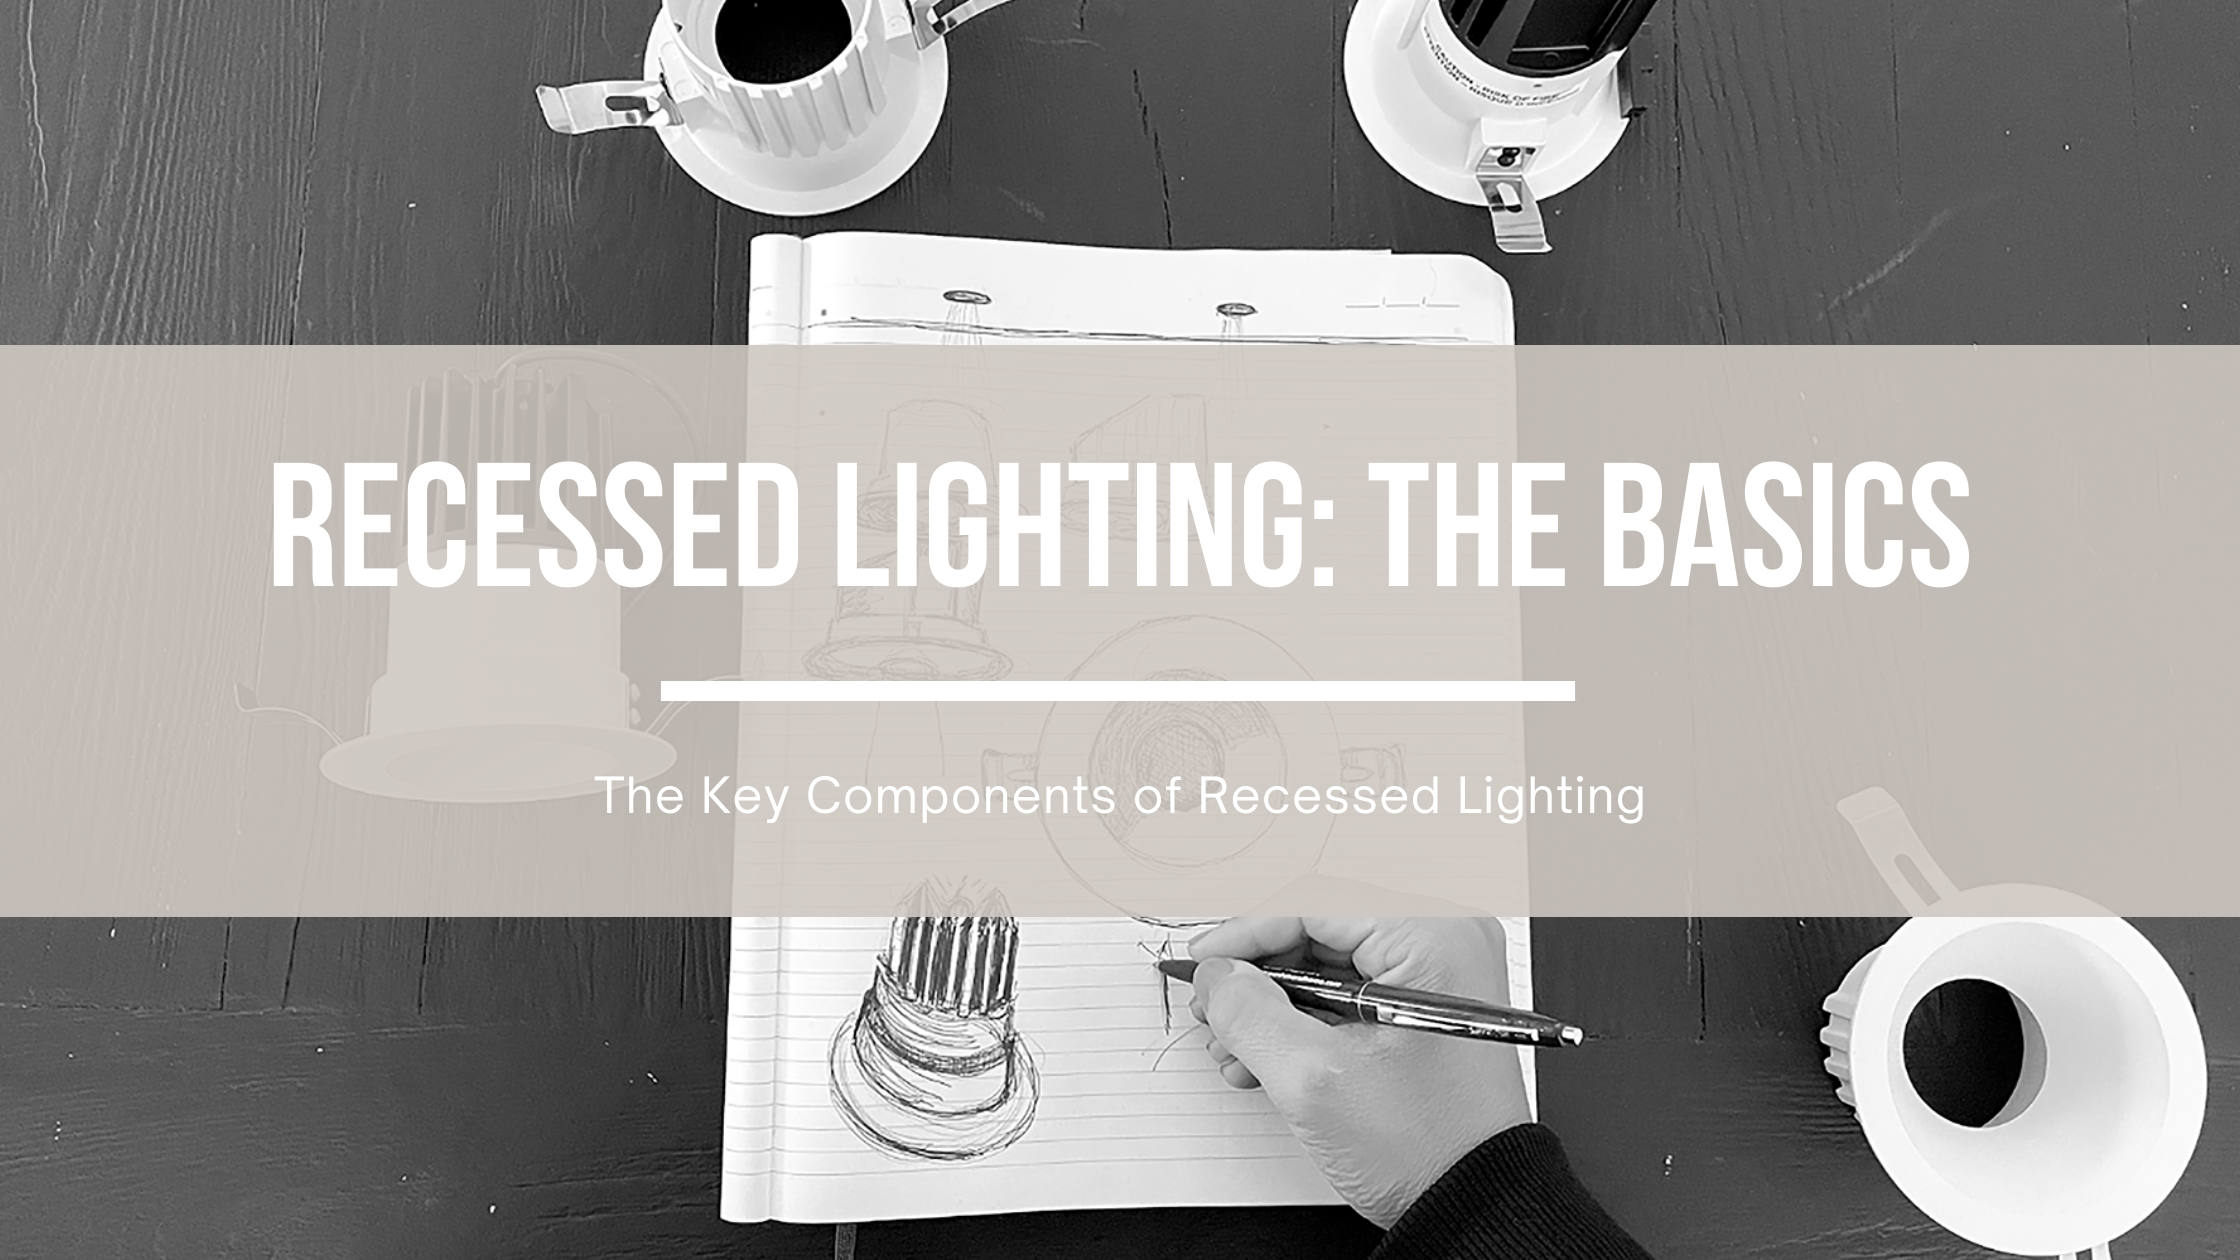 Recessed Lighting_ The Basics